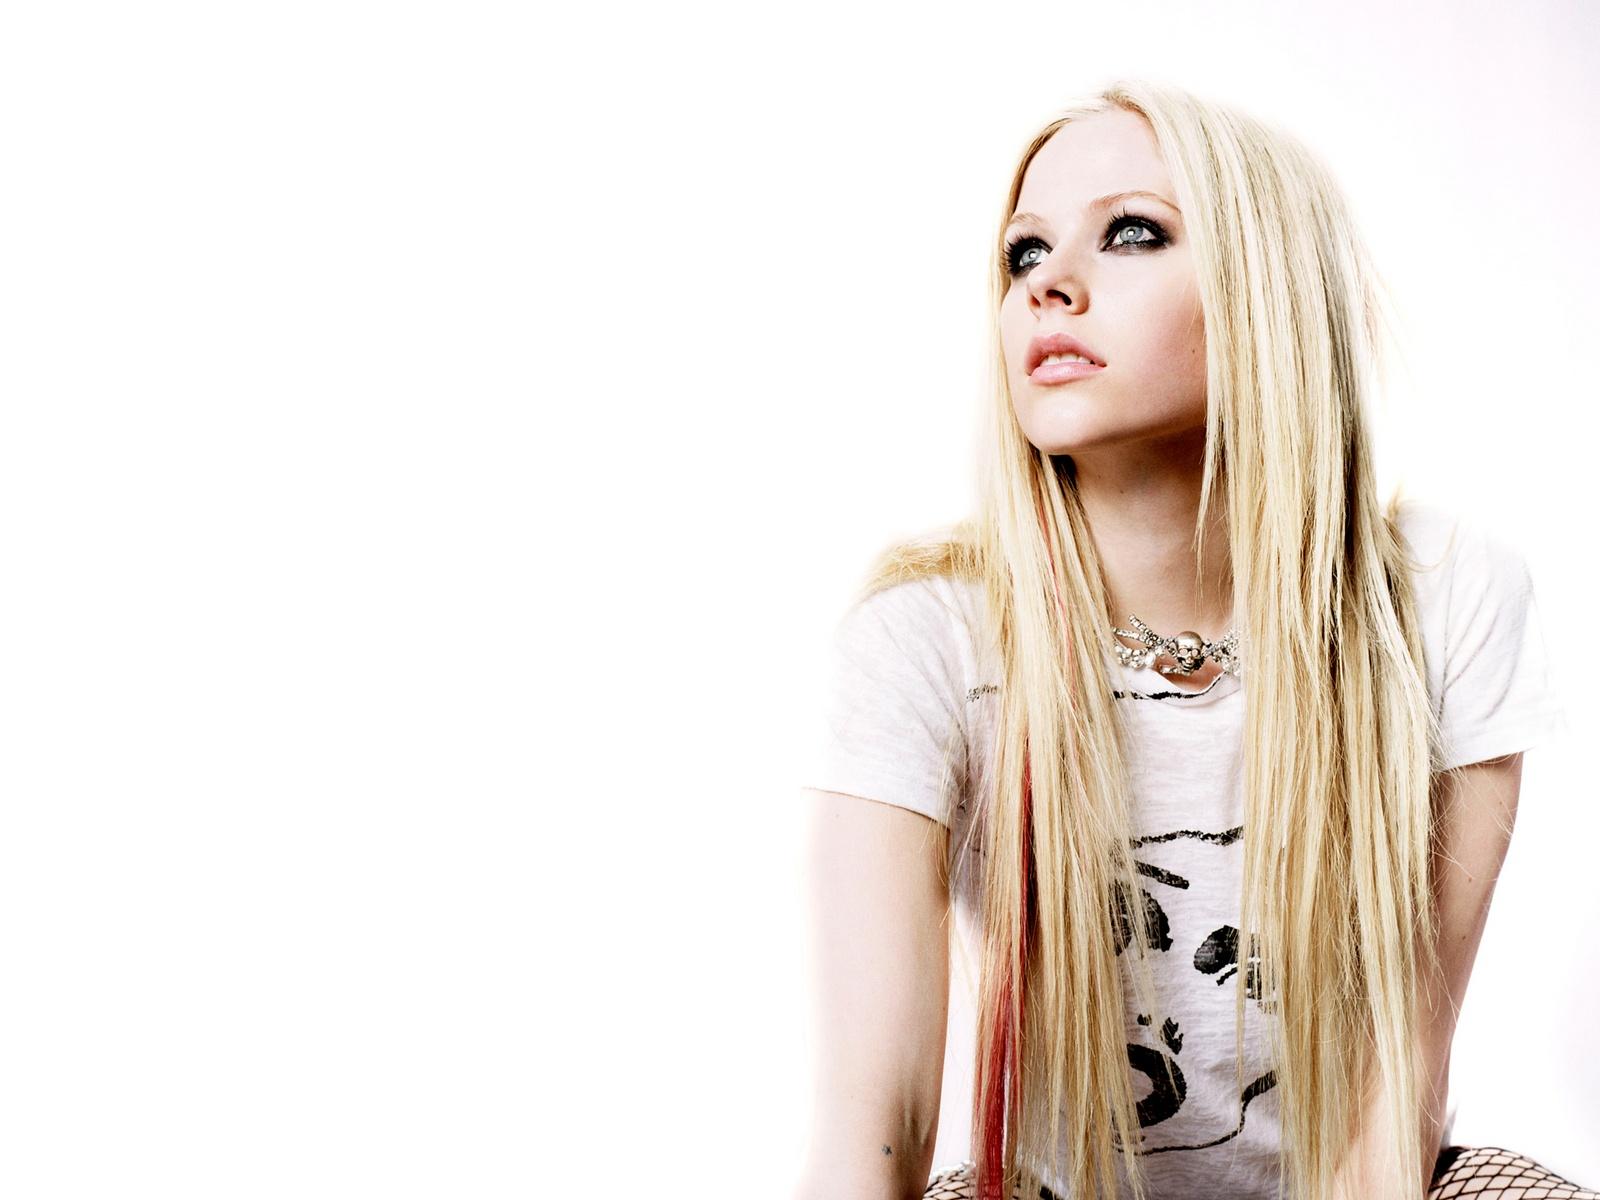 http://4.bp.blogspot.com/-9fsWy9hGR5E/UKtnMYdMikI/AAAAAAAAJpc/07eXoGmFy2Q/s1600/Avrin+Lavigne+HD+Wallpaper.jpg